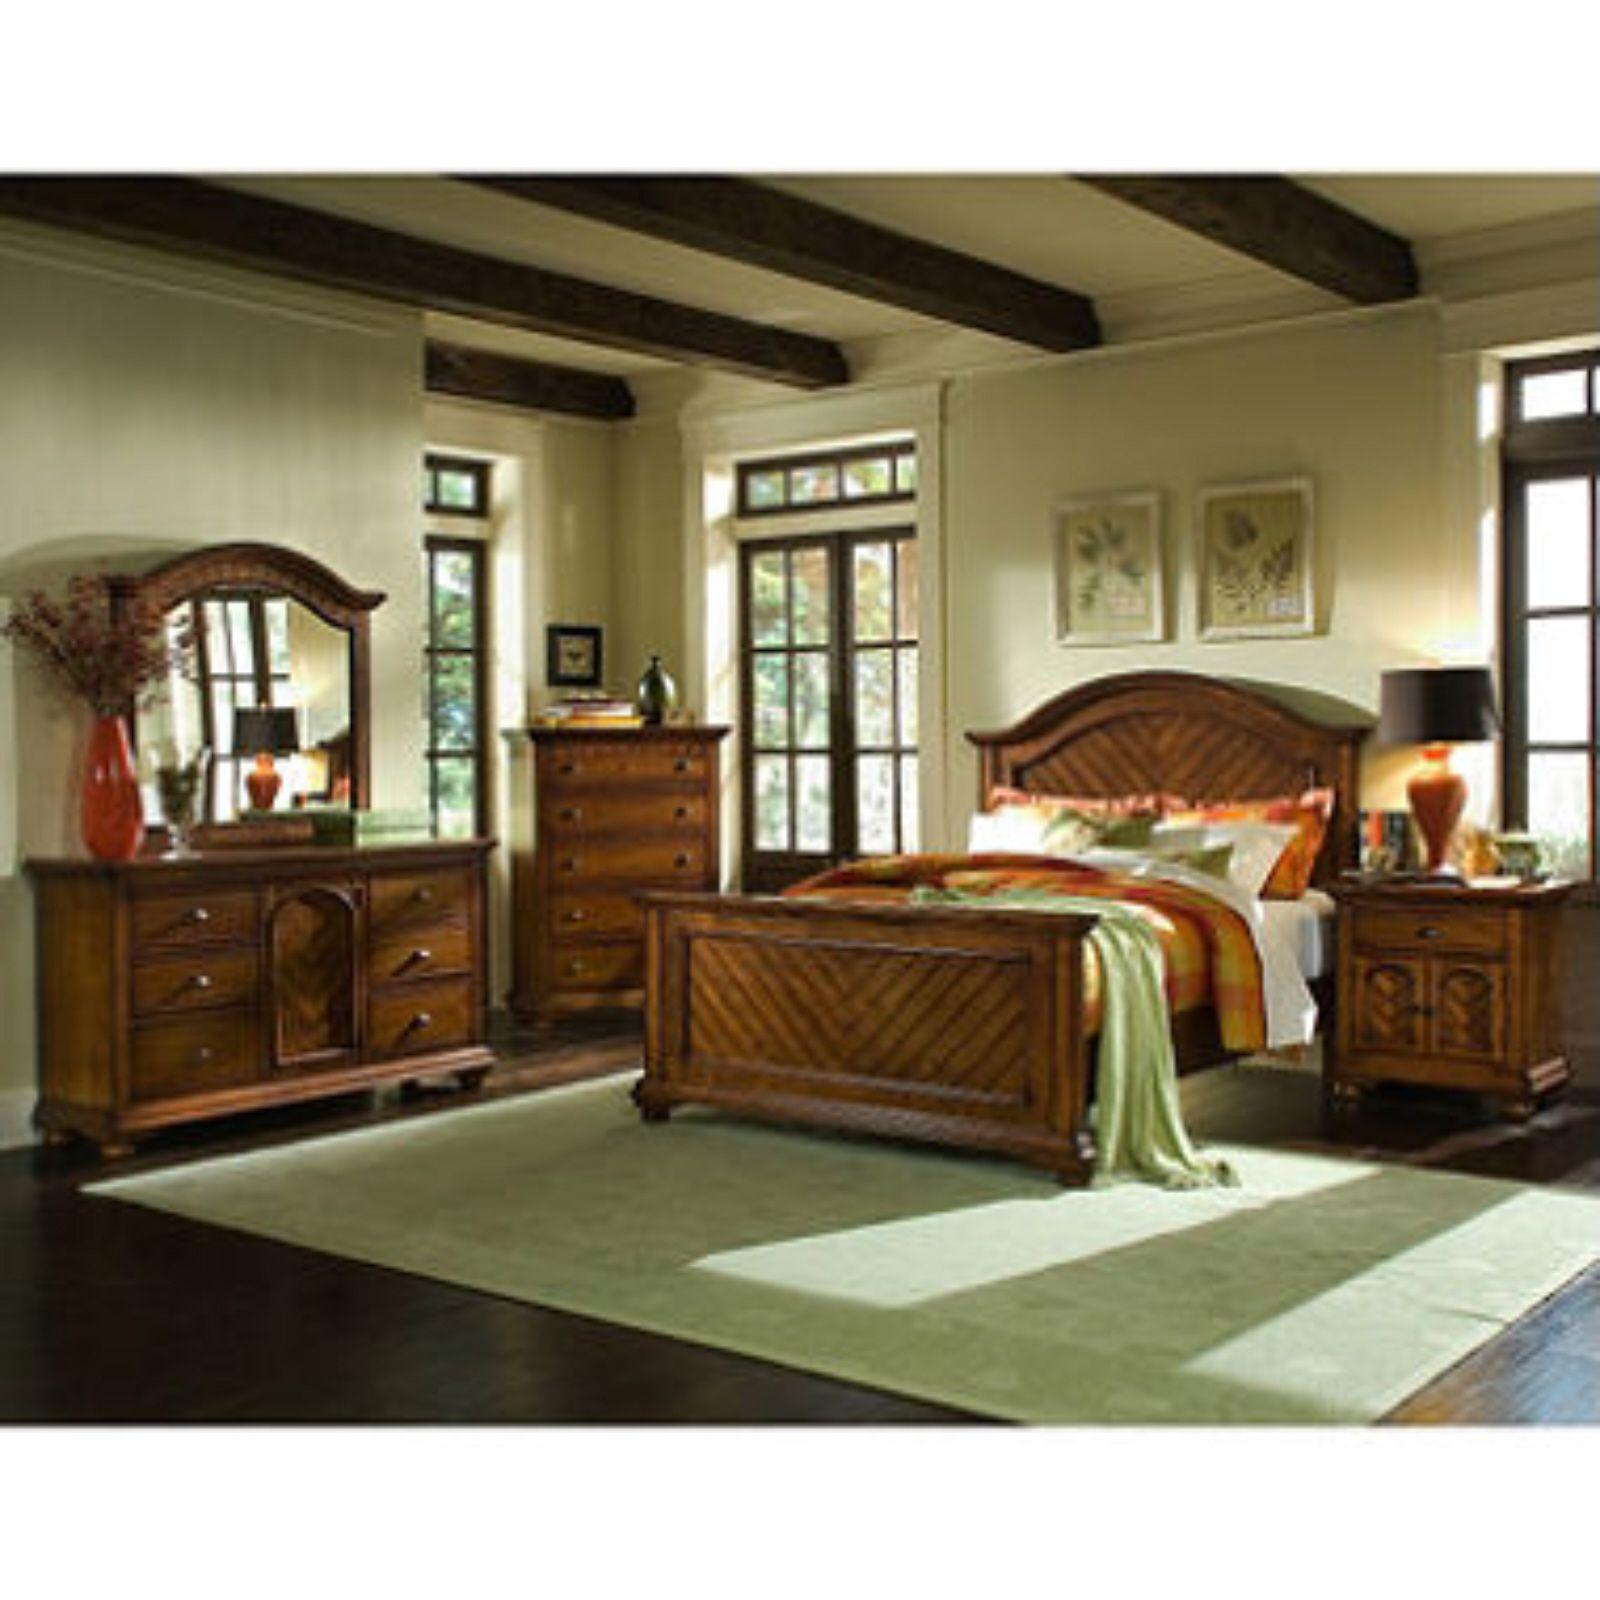 Sams Club Bedroom Furniture Addison Chestnut Bedroom Set Queen 6 Pc Bedroom Furniture